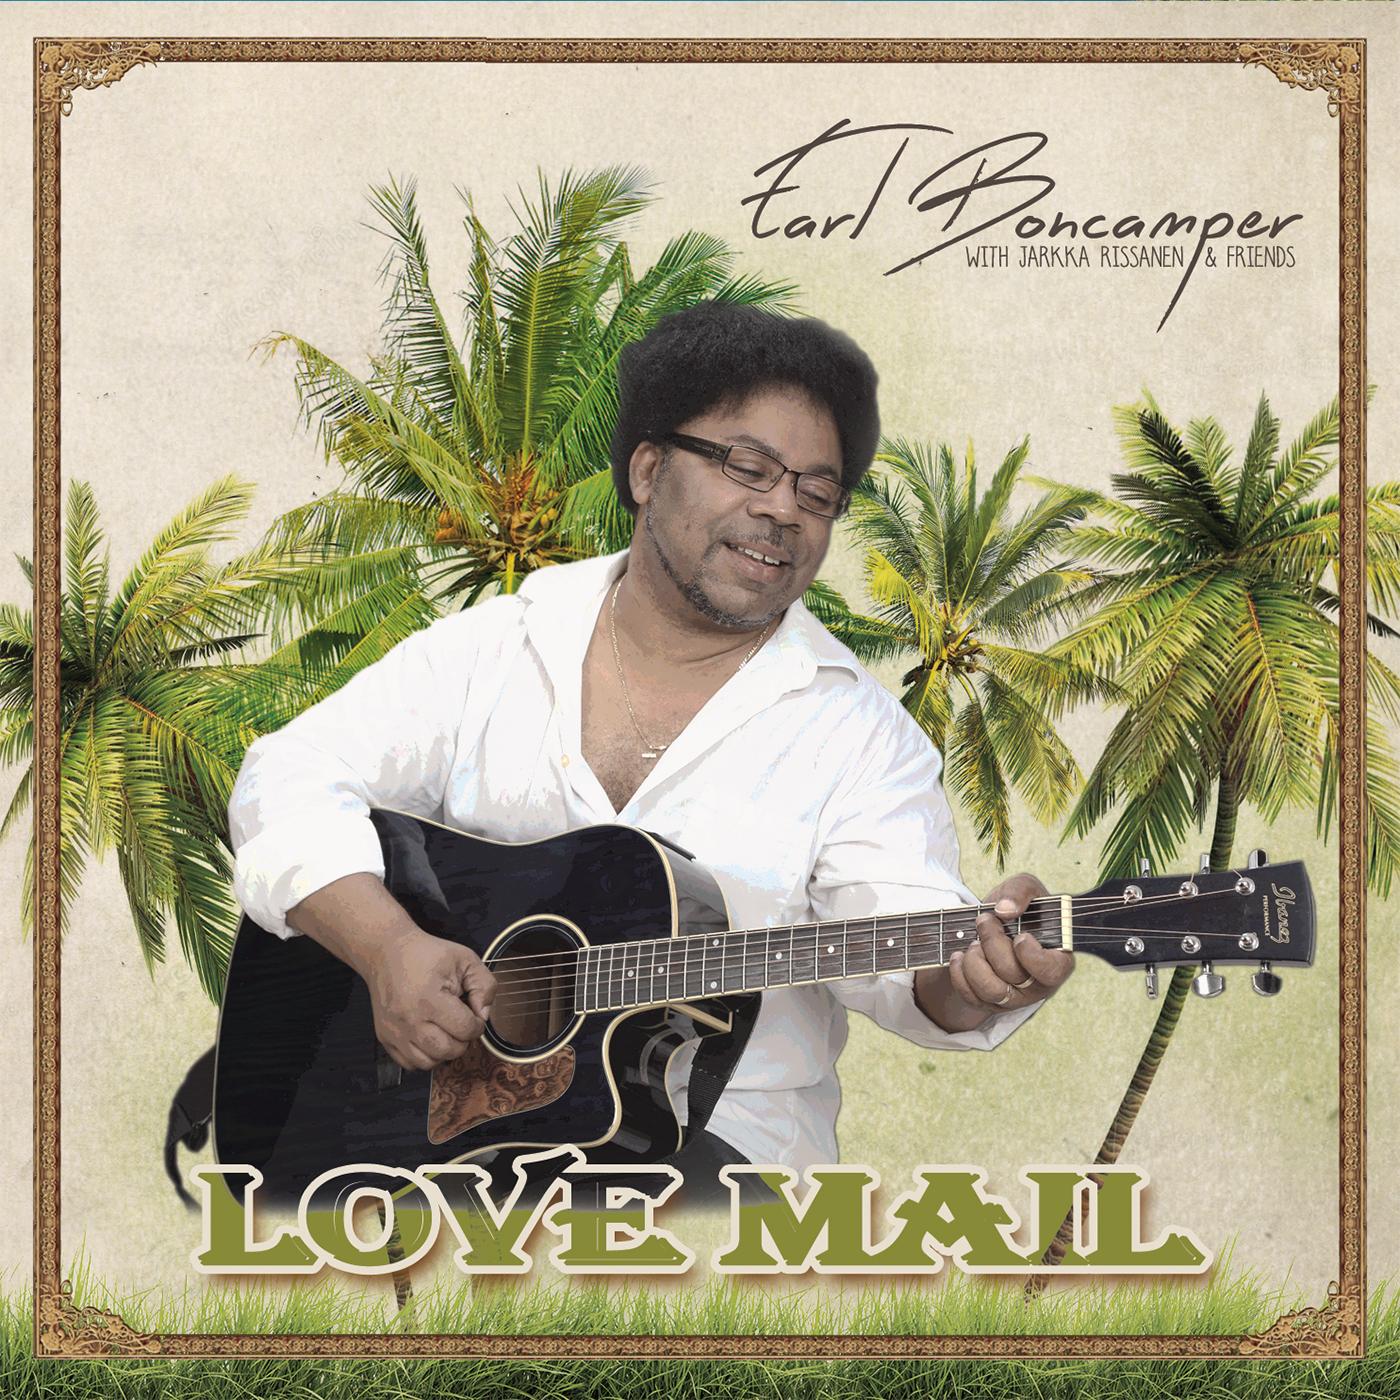 Earl S. Boncamper: Love Mail